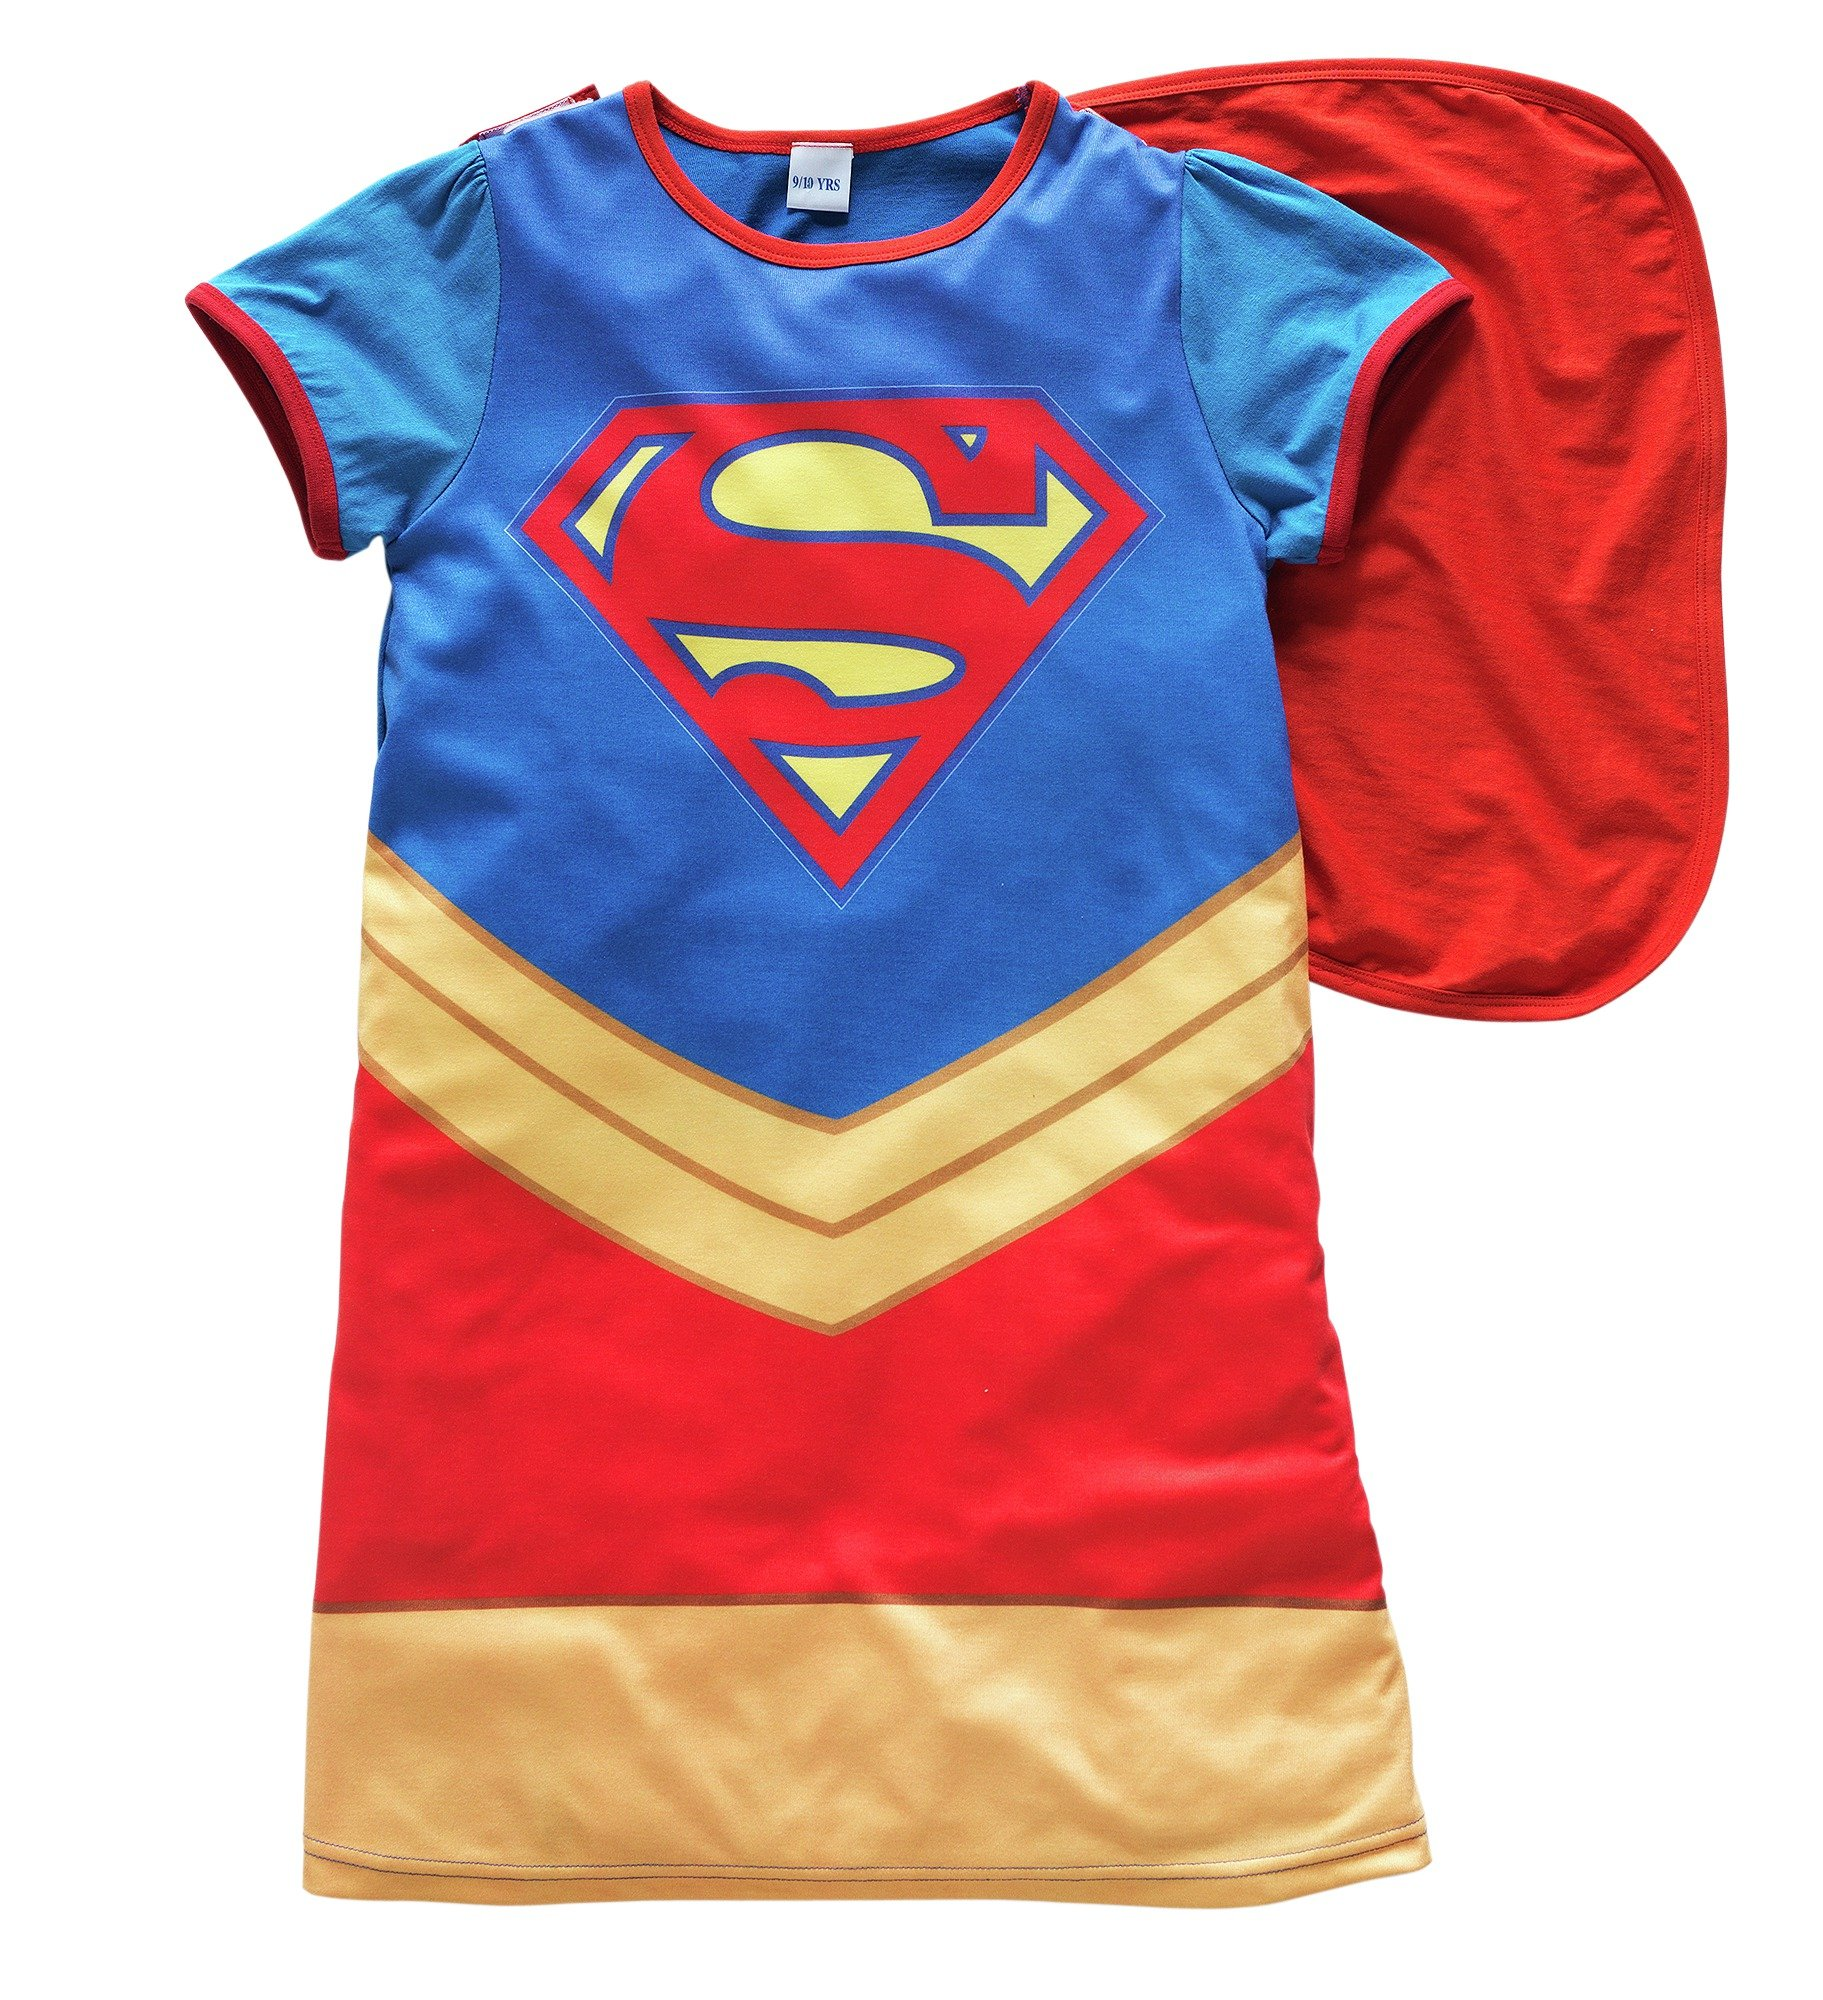 Image of DC Supergirl Nightie - 5-6 Years